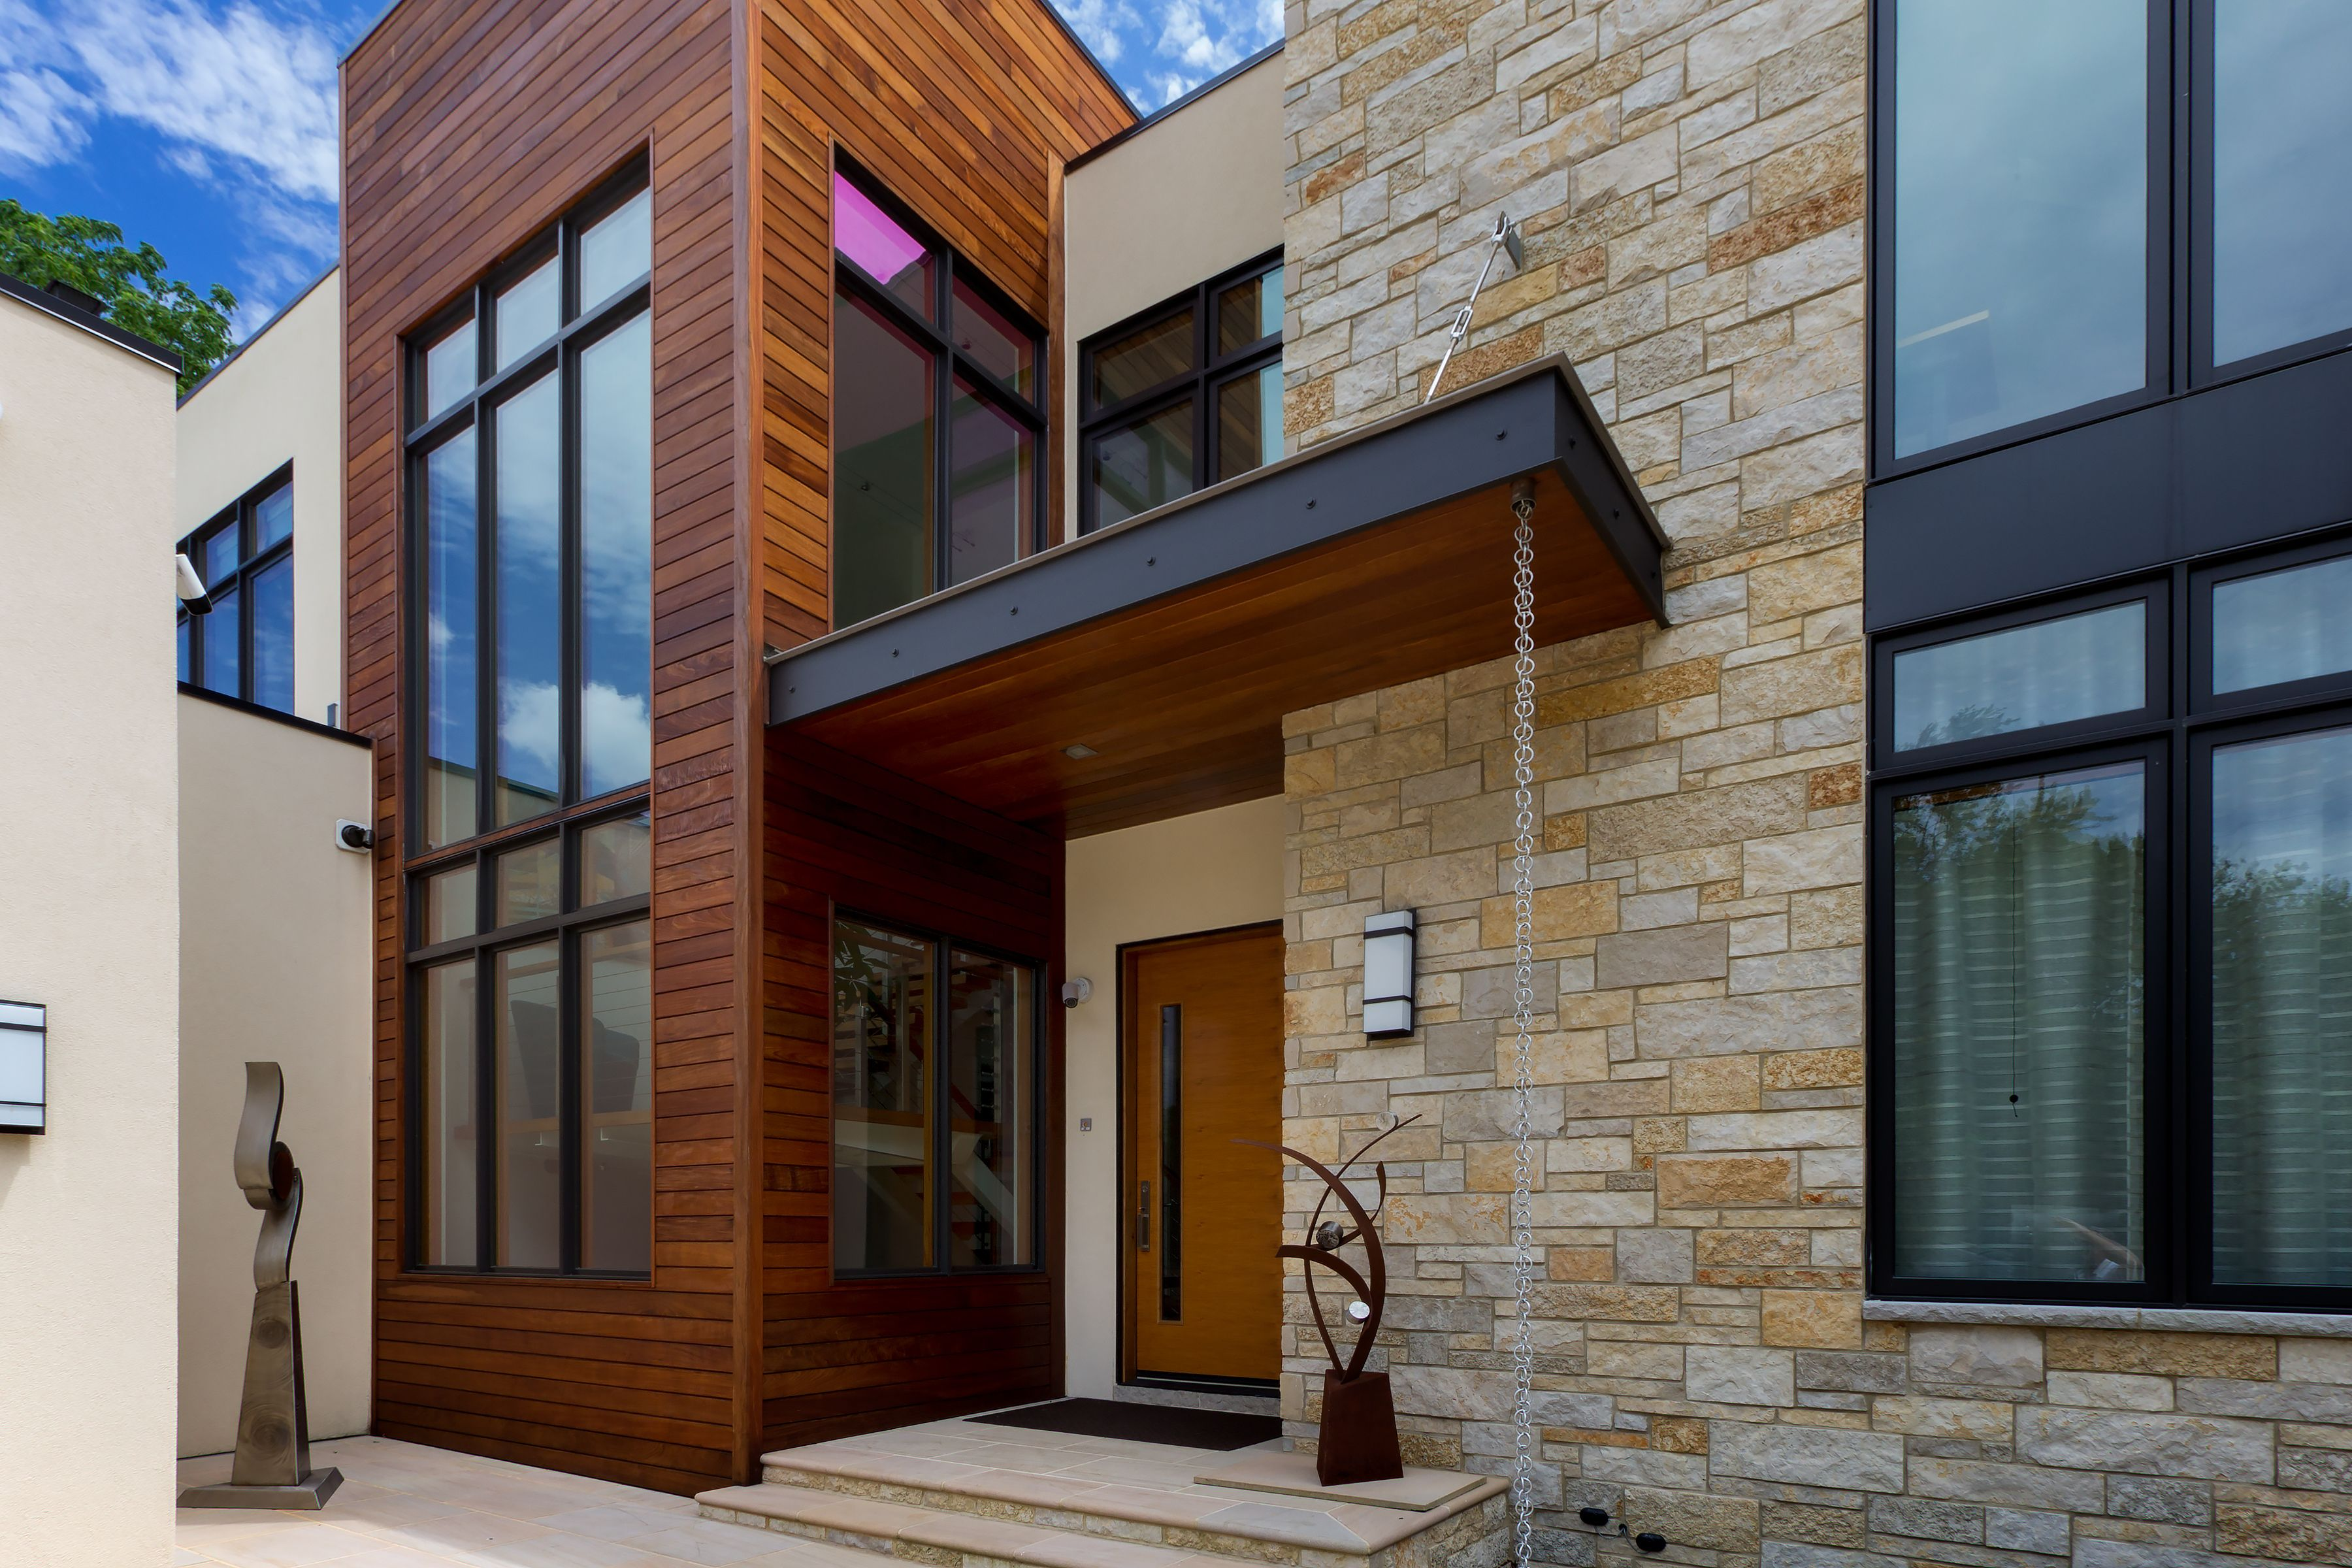 Home design bildergalerie studiozdc contemporaryarchitecture contemporarydesign modern